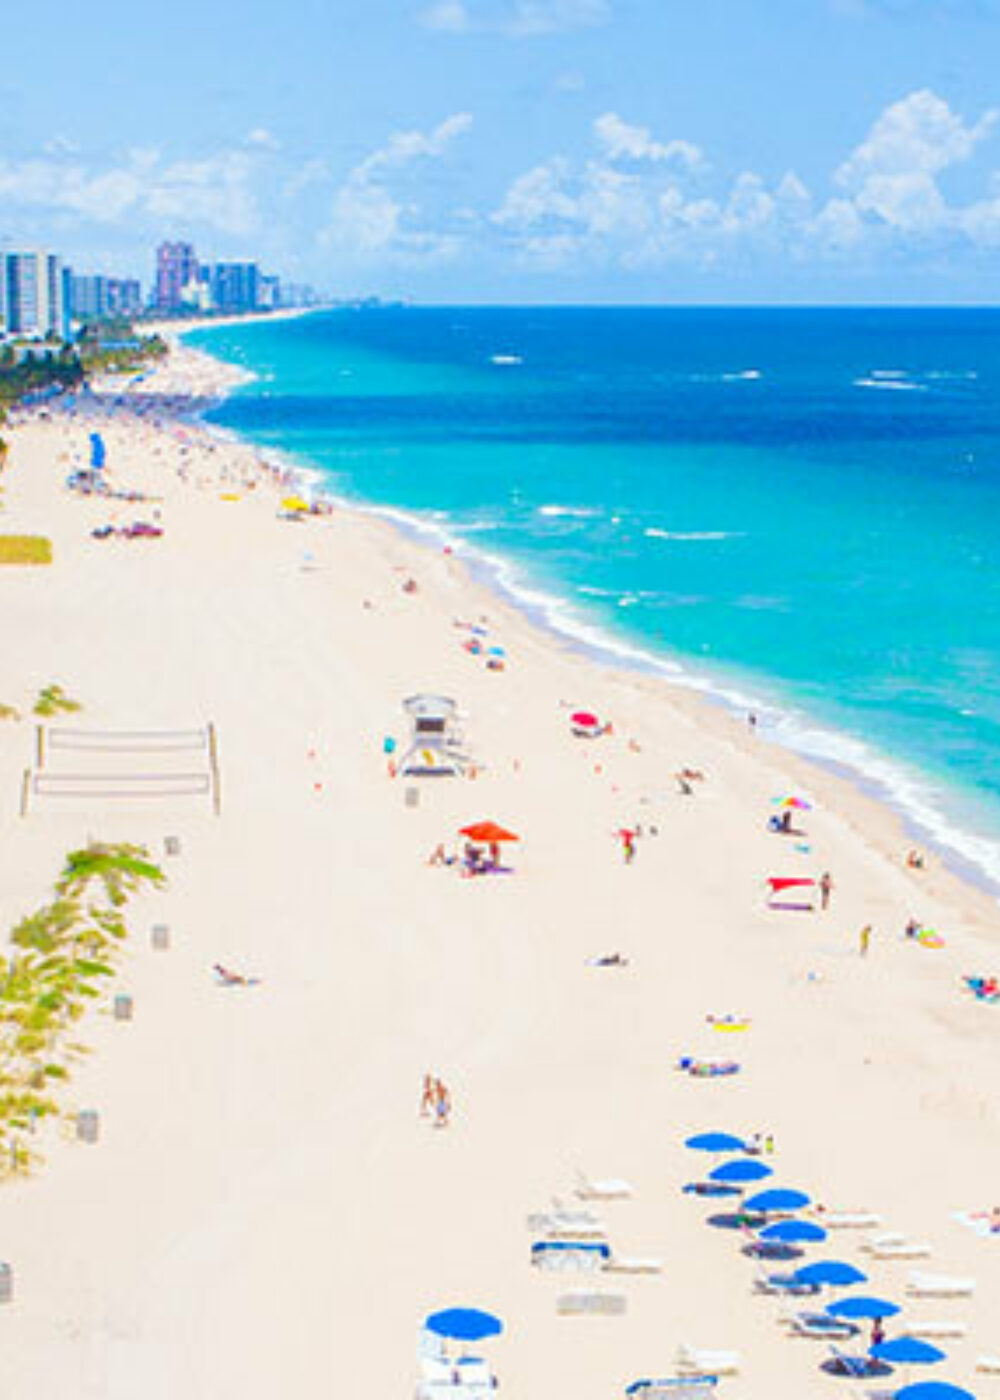 Green Motion Car Rental United States Florida Fort Lauderdale International Airport 1400x400